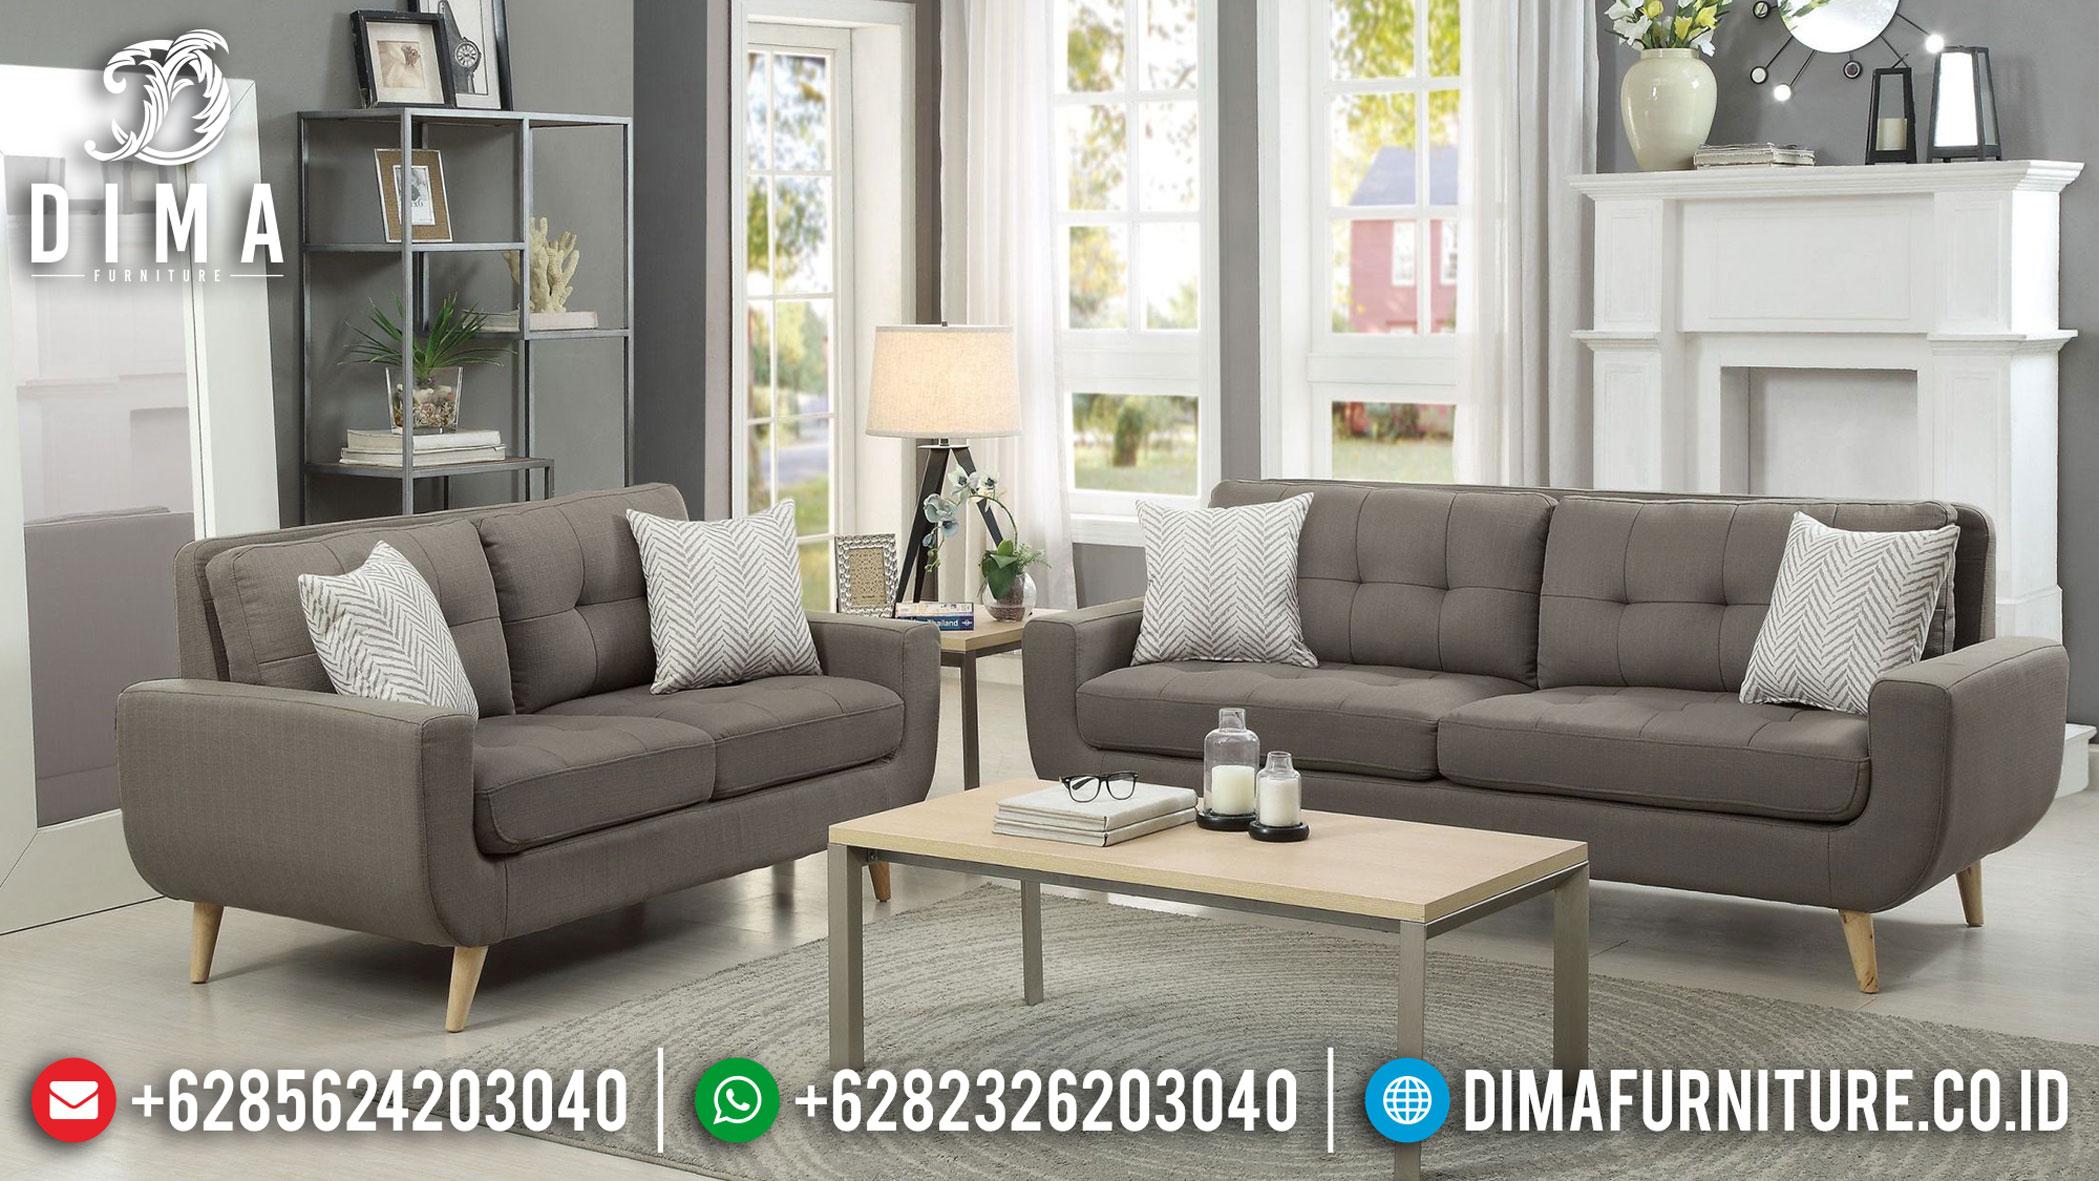 Best Sale Sofa Tamu Minimalis Classic Retro French Style New 2021 TTJ-1199